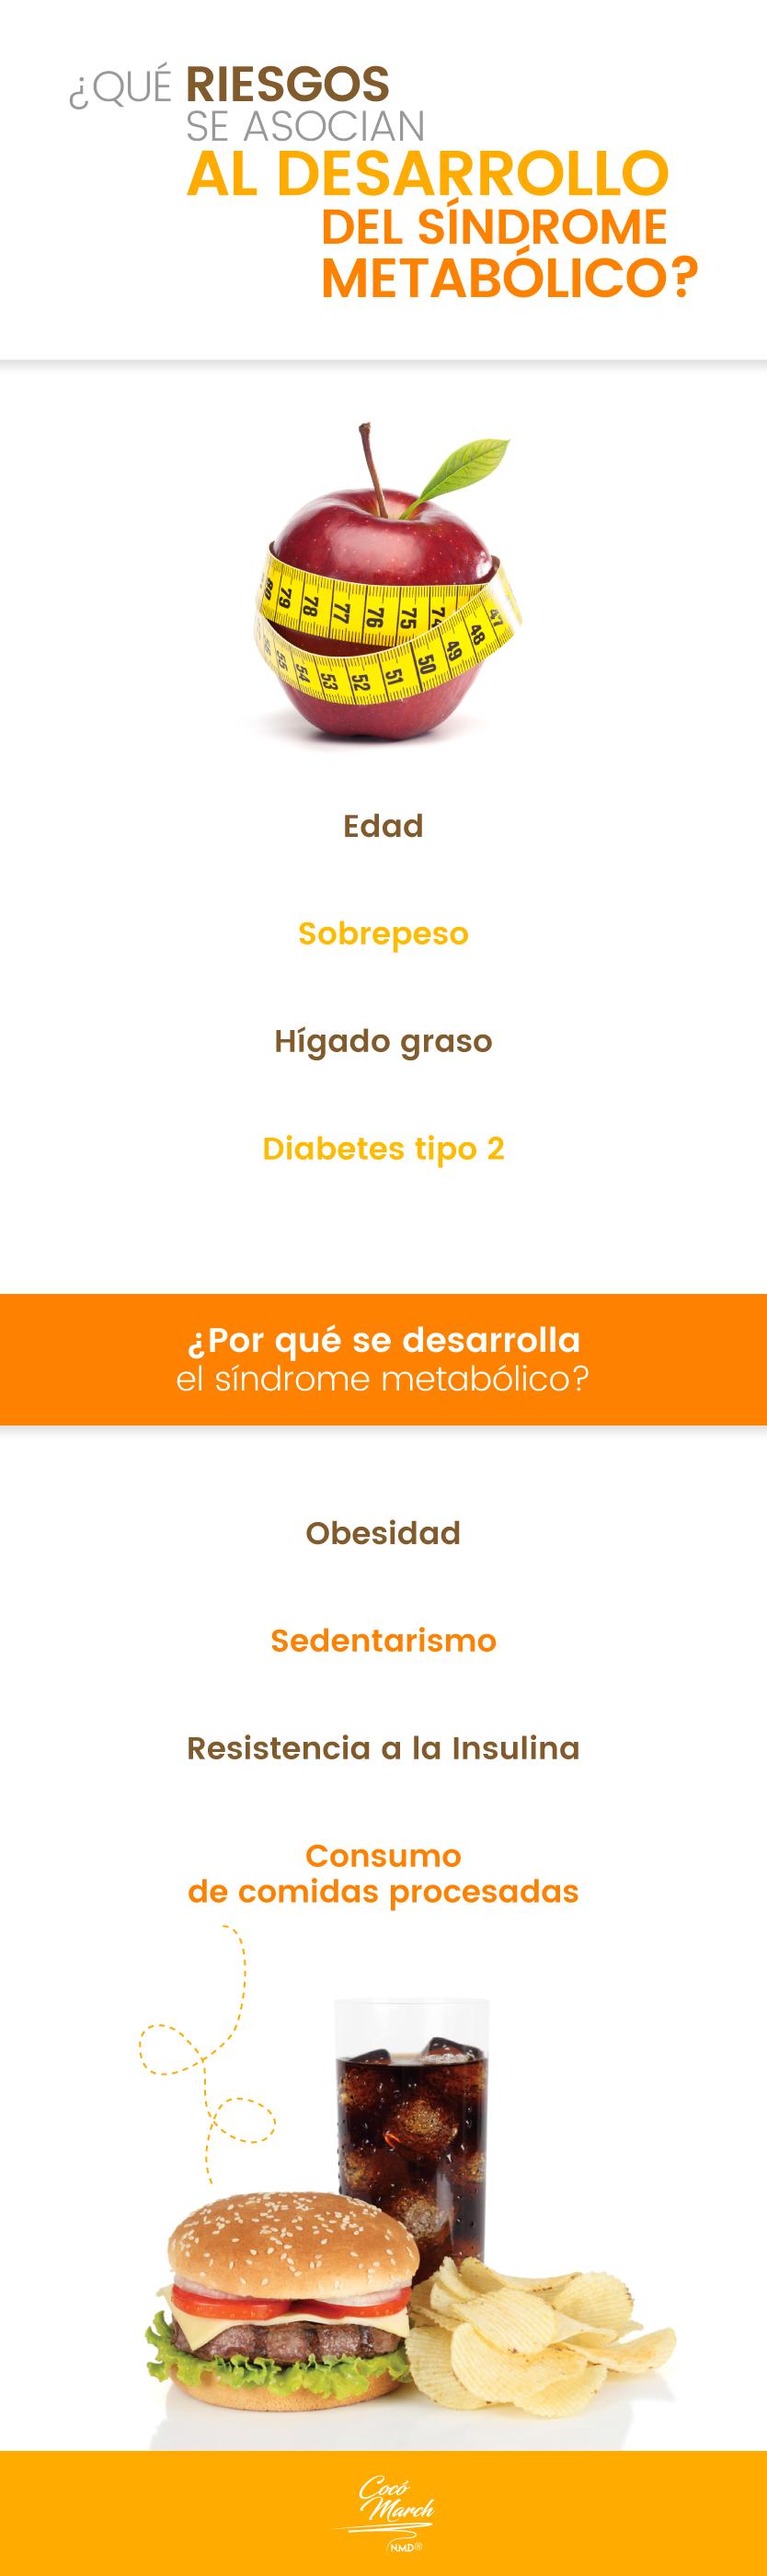 sindrome-metabolico-riesgos